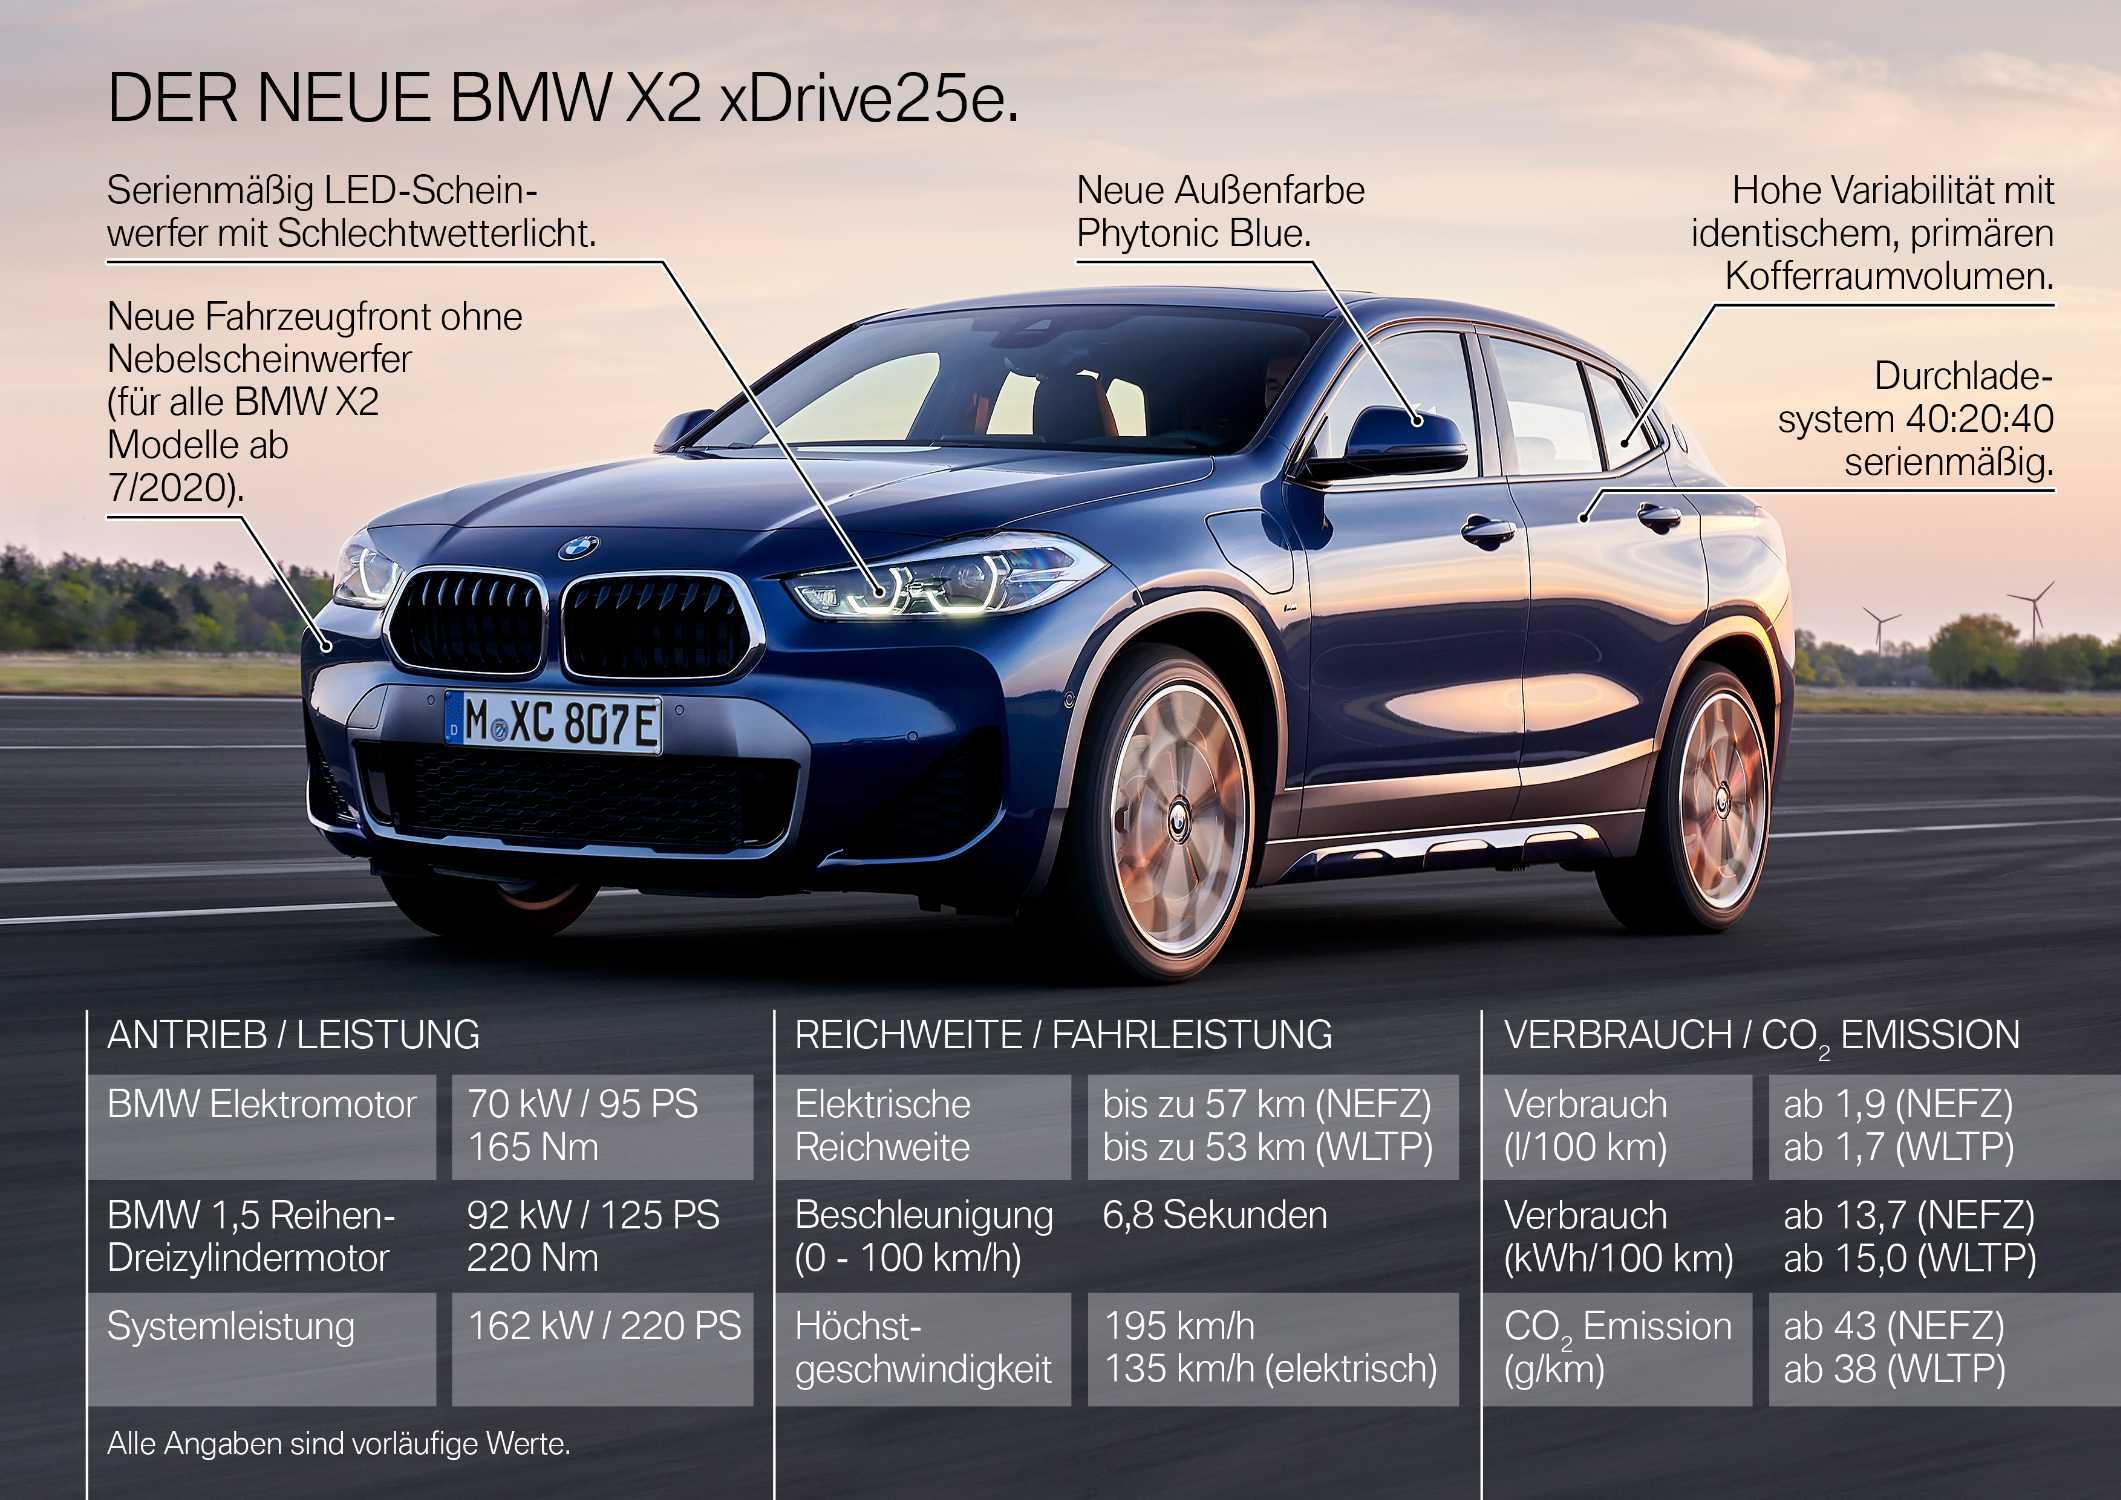 Der neue BMW X2 xDrive25e - Highlights (05/2020).